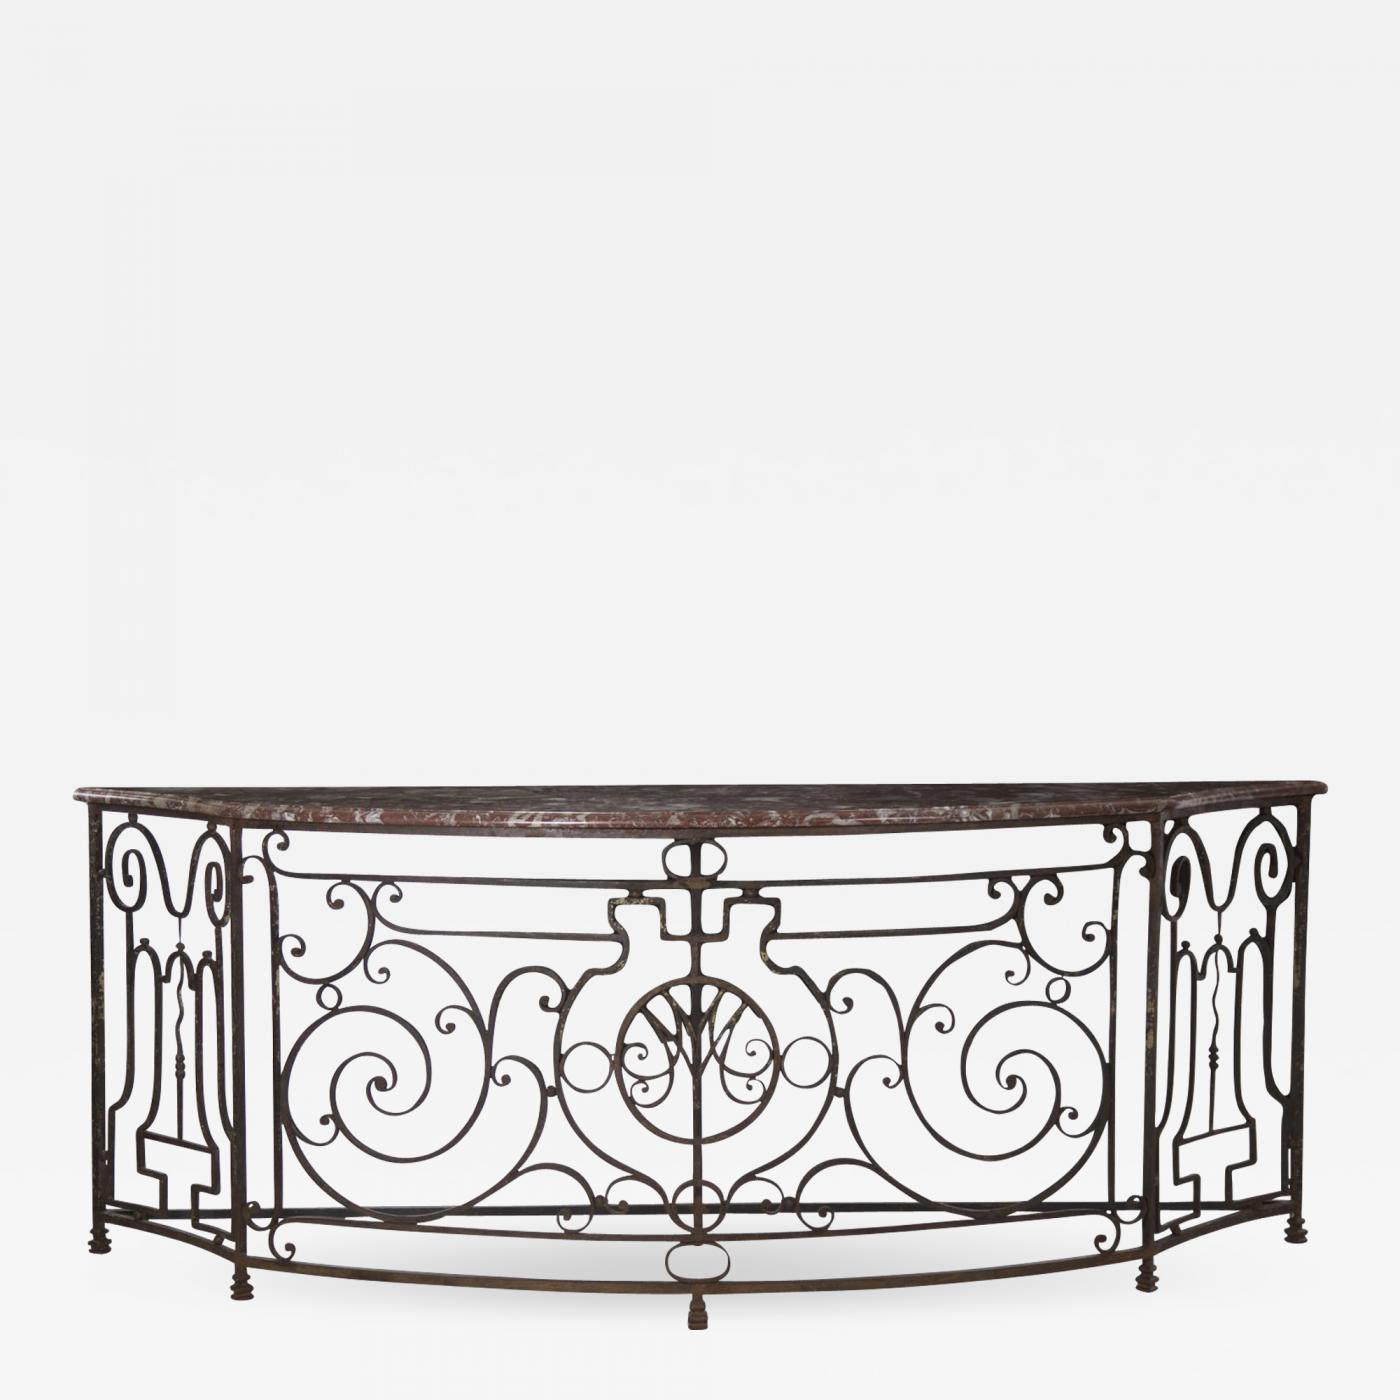 Remarkable Massive 19Th Century French Wrought Iron Console Table Inzonedesignstudio Interior Chair Design Inzonedesignstudiocom